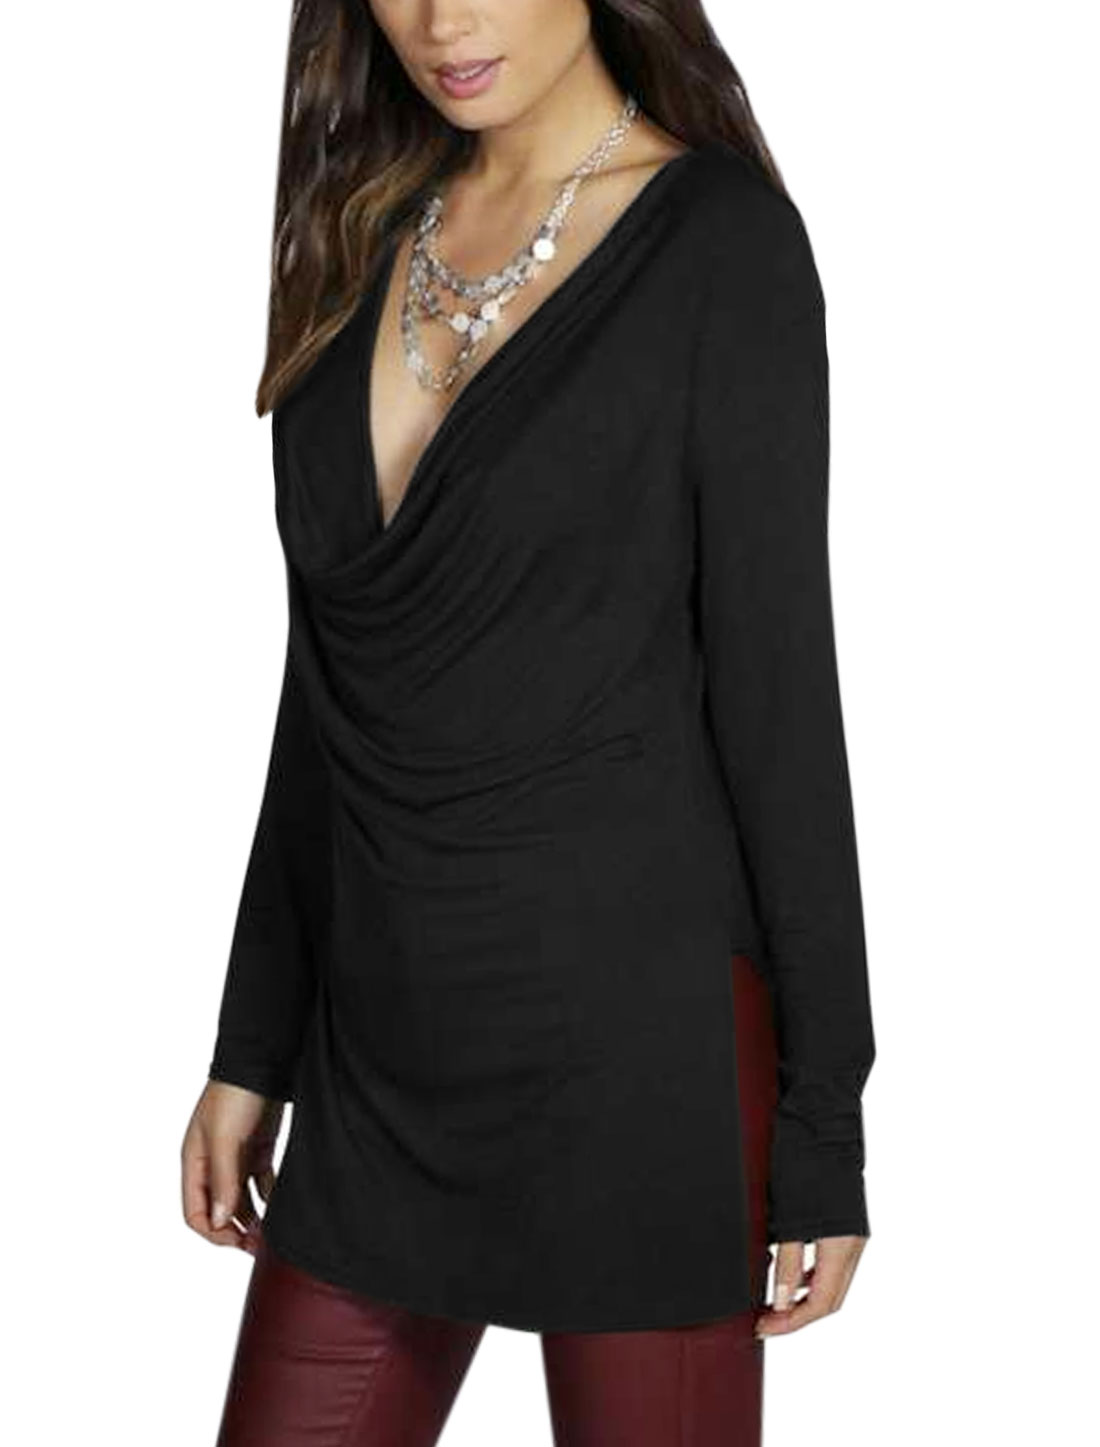 Women Cowl Neck Split Sides Casual Tunic T-Shirt Black M